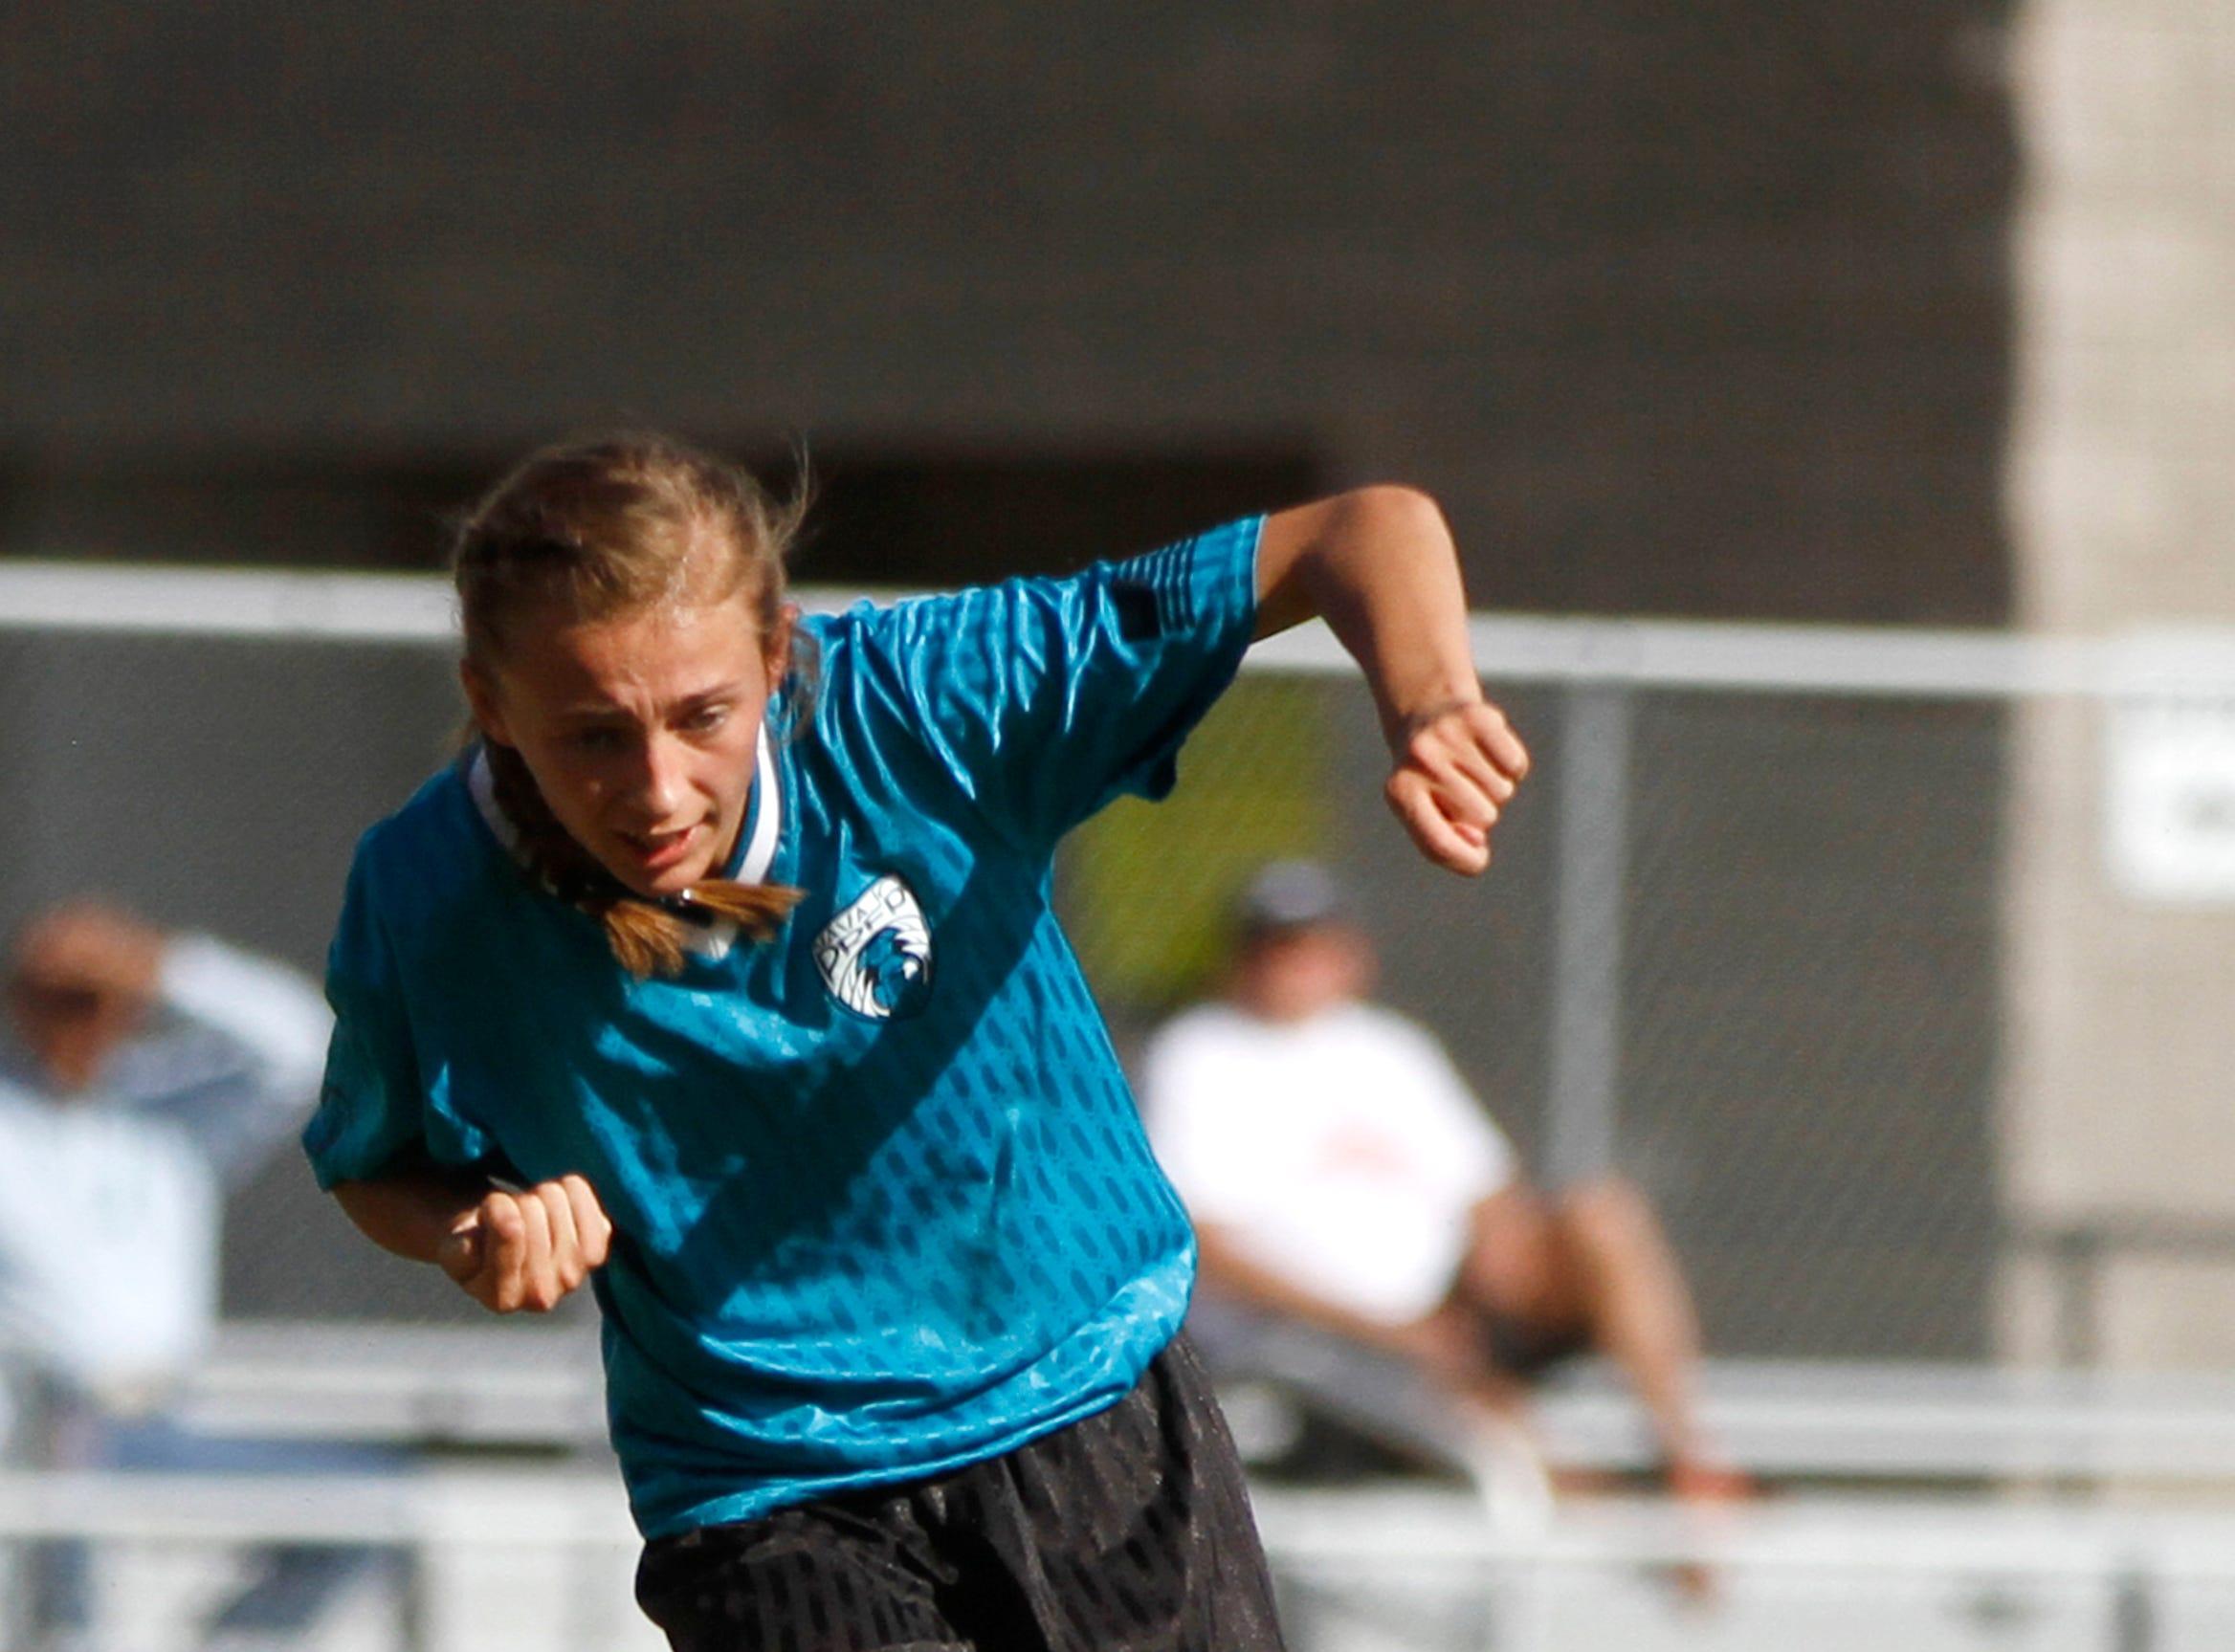 Navajo Prep's Emma Mohs passes the ball to a teammate, Tuesday, Sept. 11, 2018 at Eagle Stadium in Farmington.